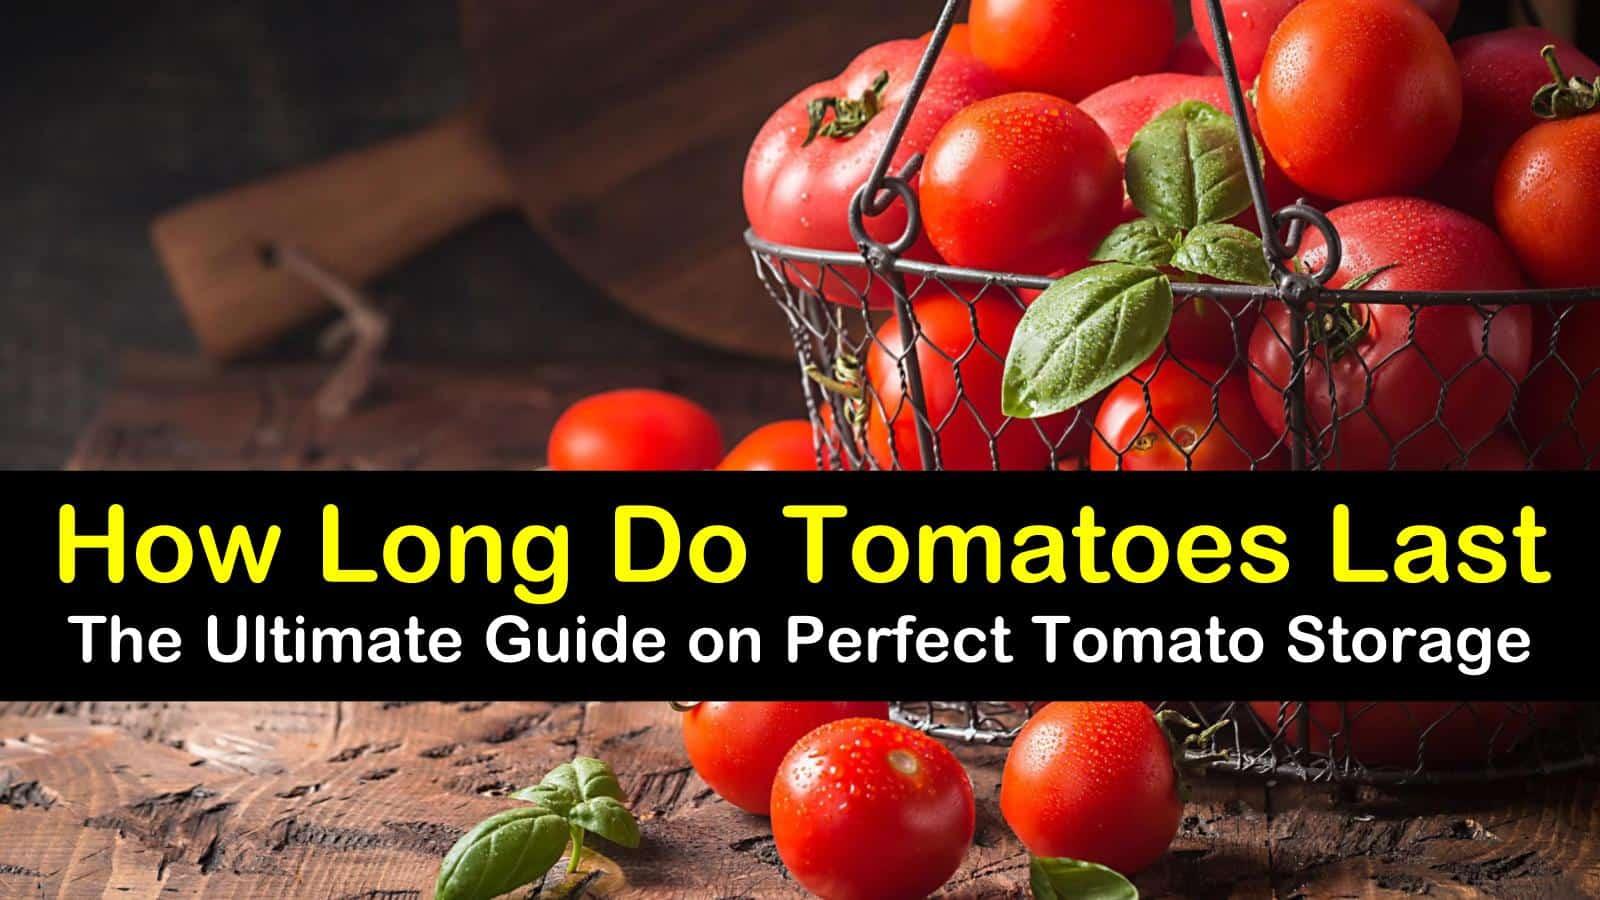 how long do tomatoes last titleimg1